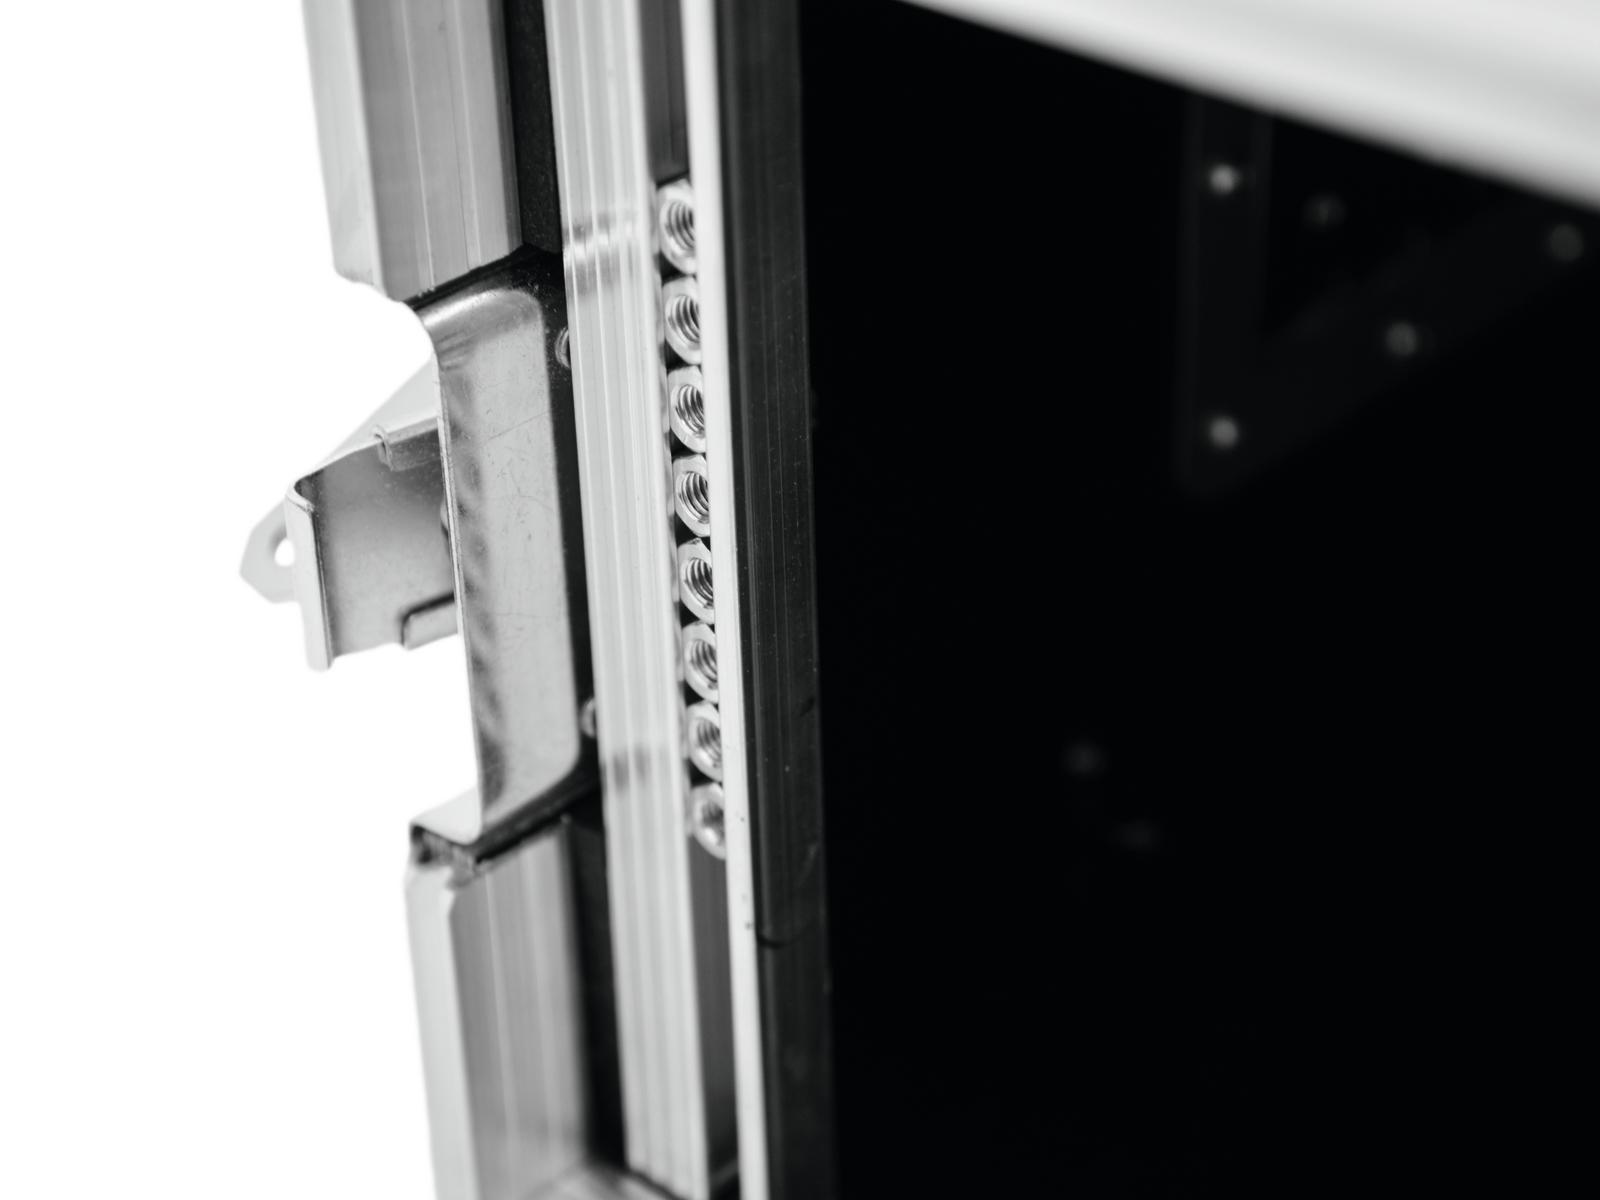 ROADINGER Rack Profi 12U 45cm